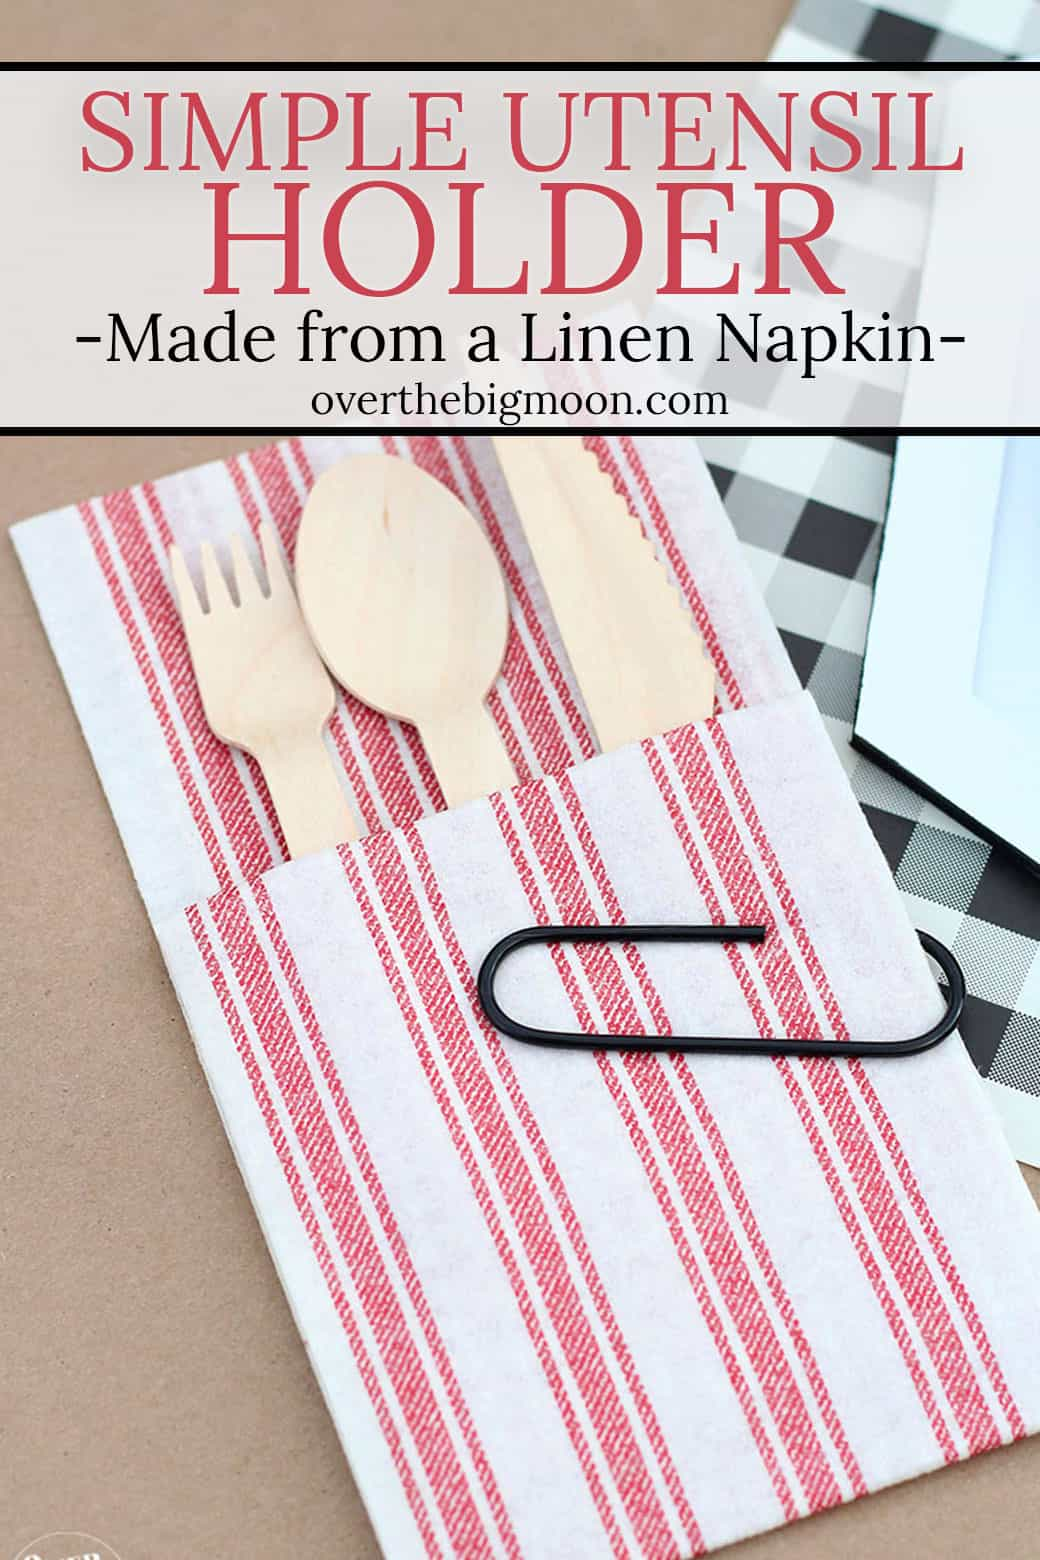 Simple Utensil Holder idea using just a linen napkin! From overthebigmoon.com!